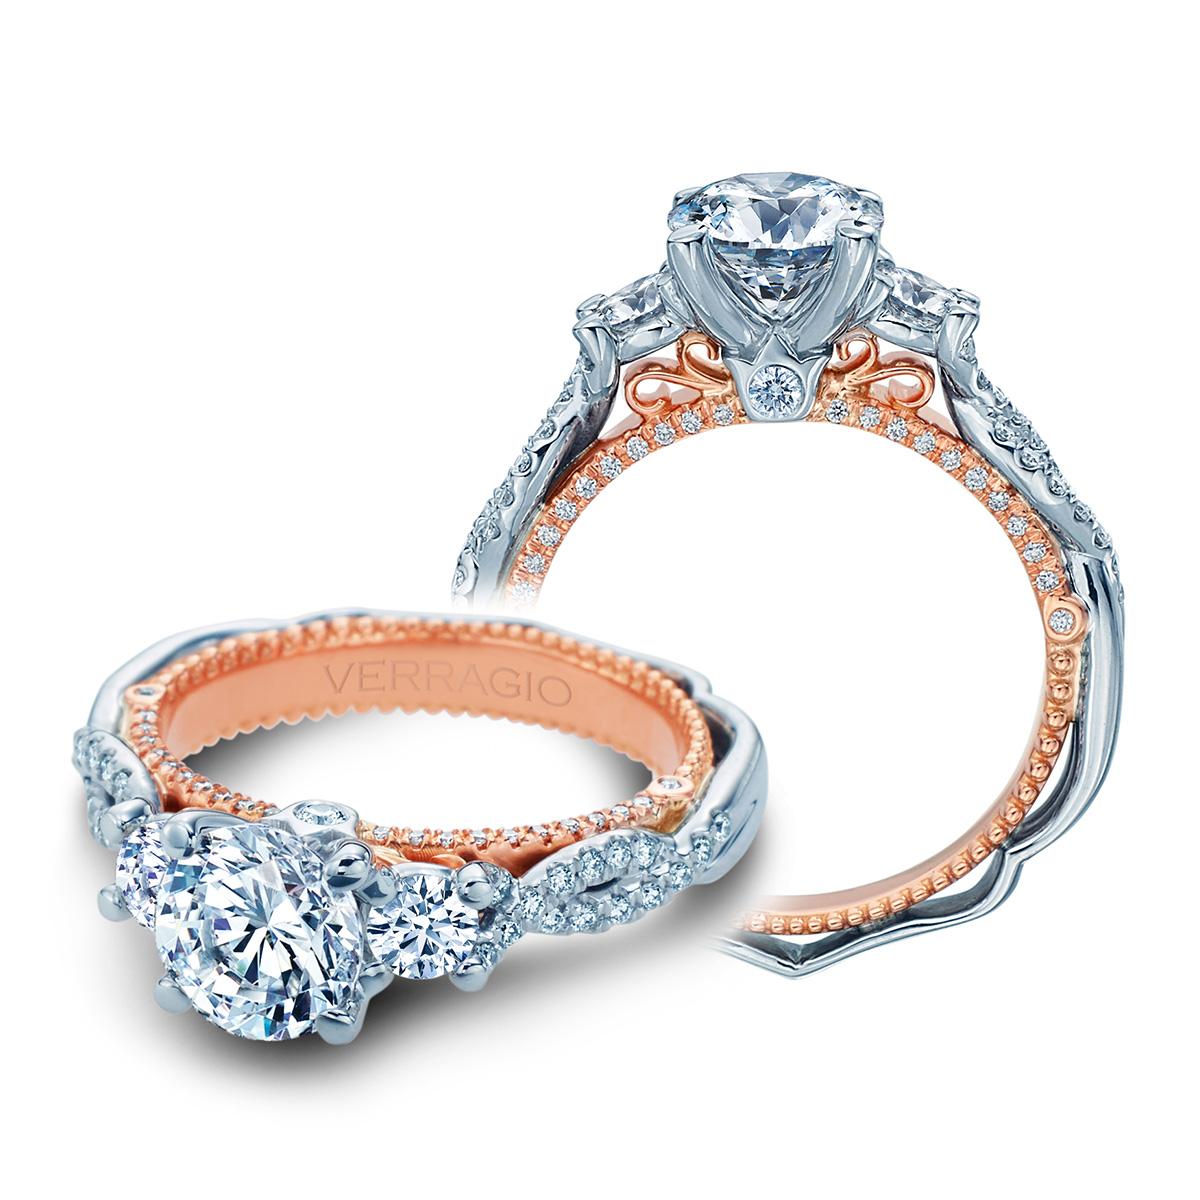 verragio venetian 5069r 2wr 18 karat engagement ring tq